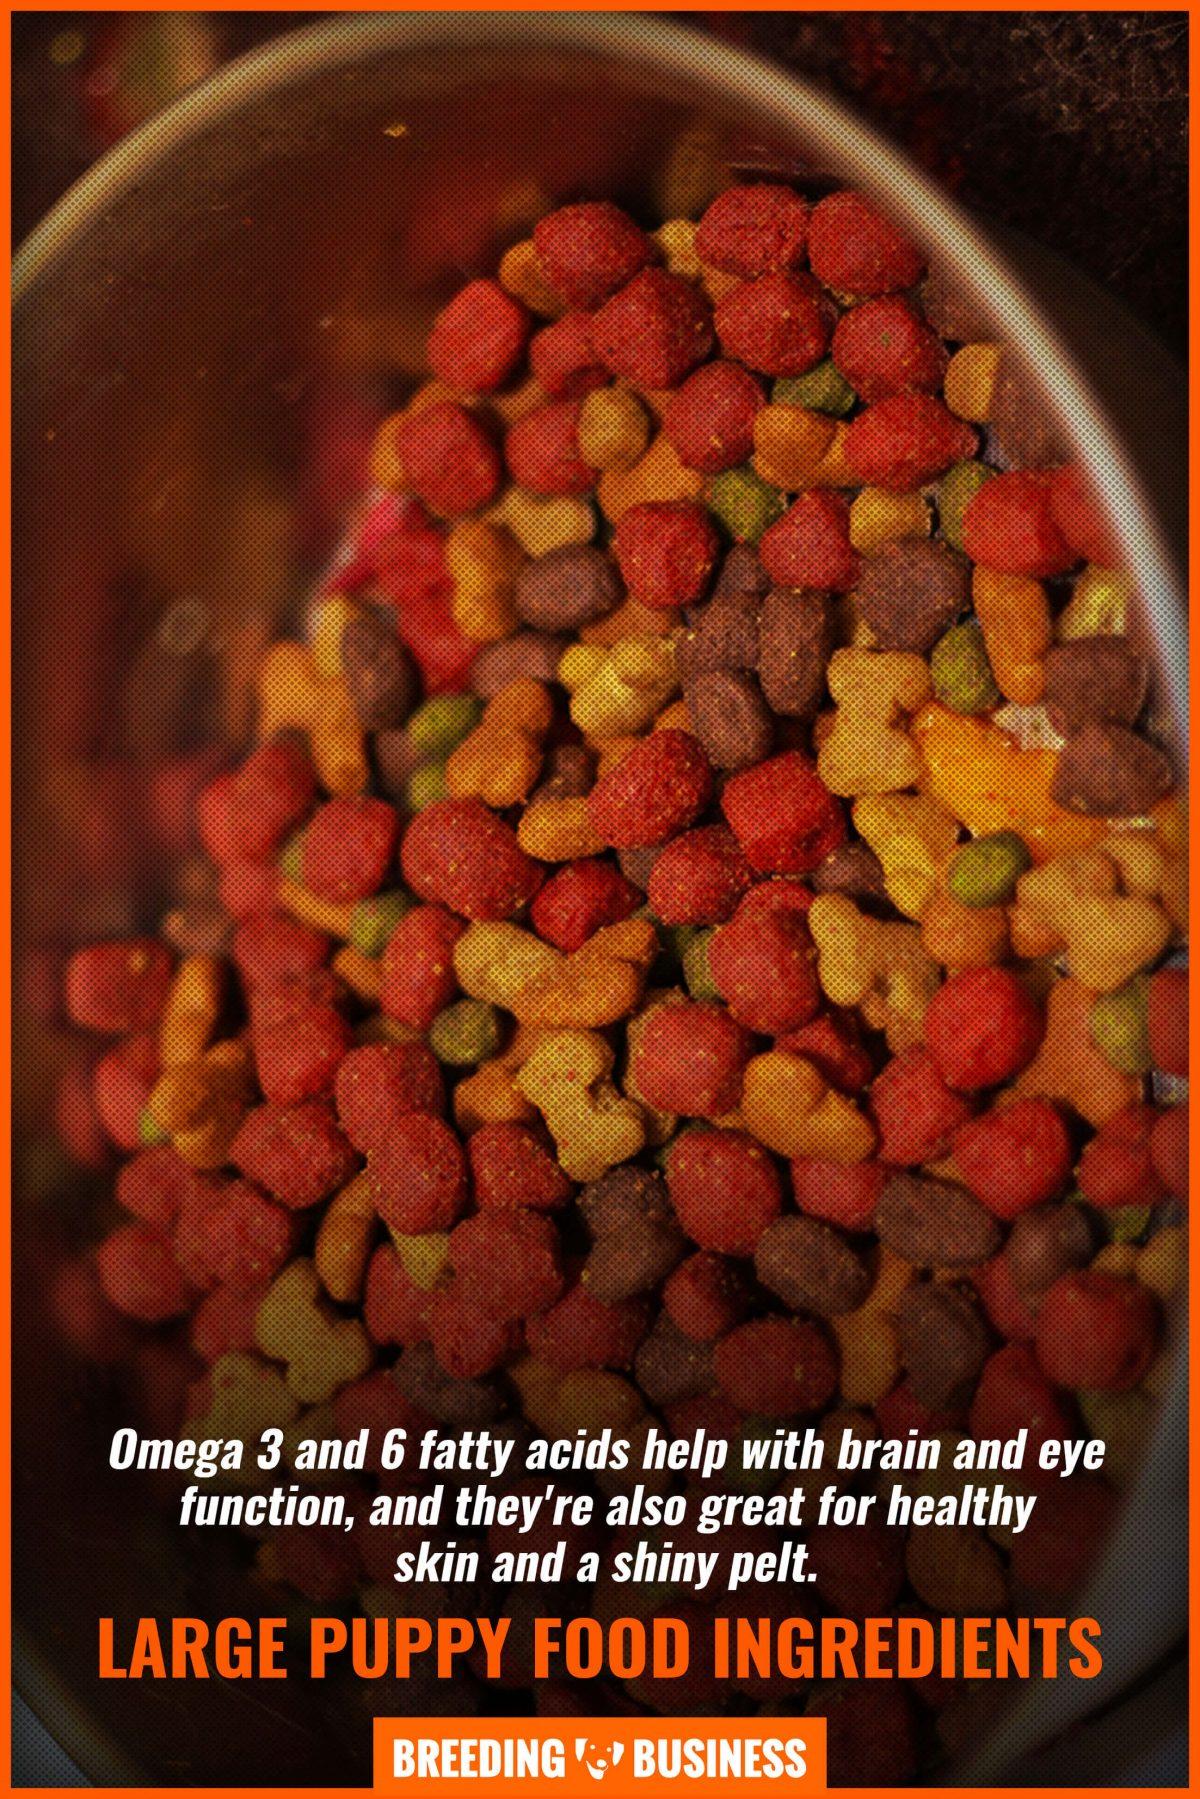 large puppy food ingredients